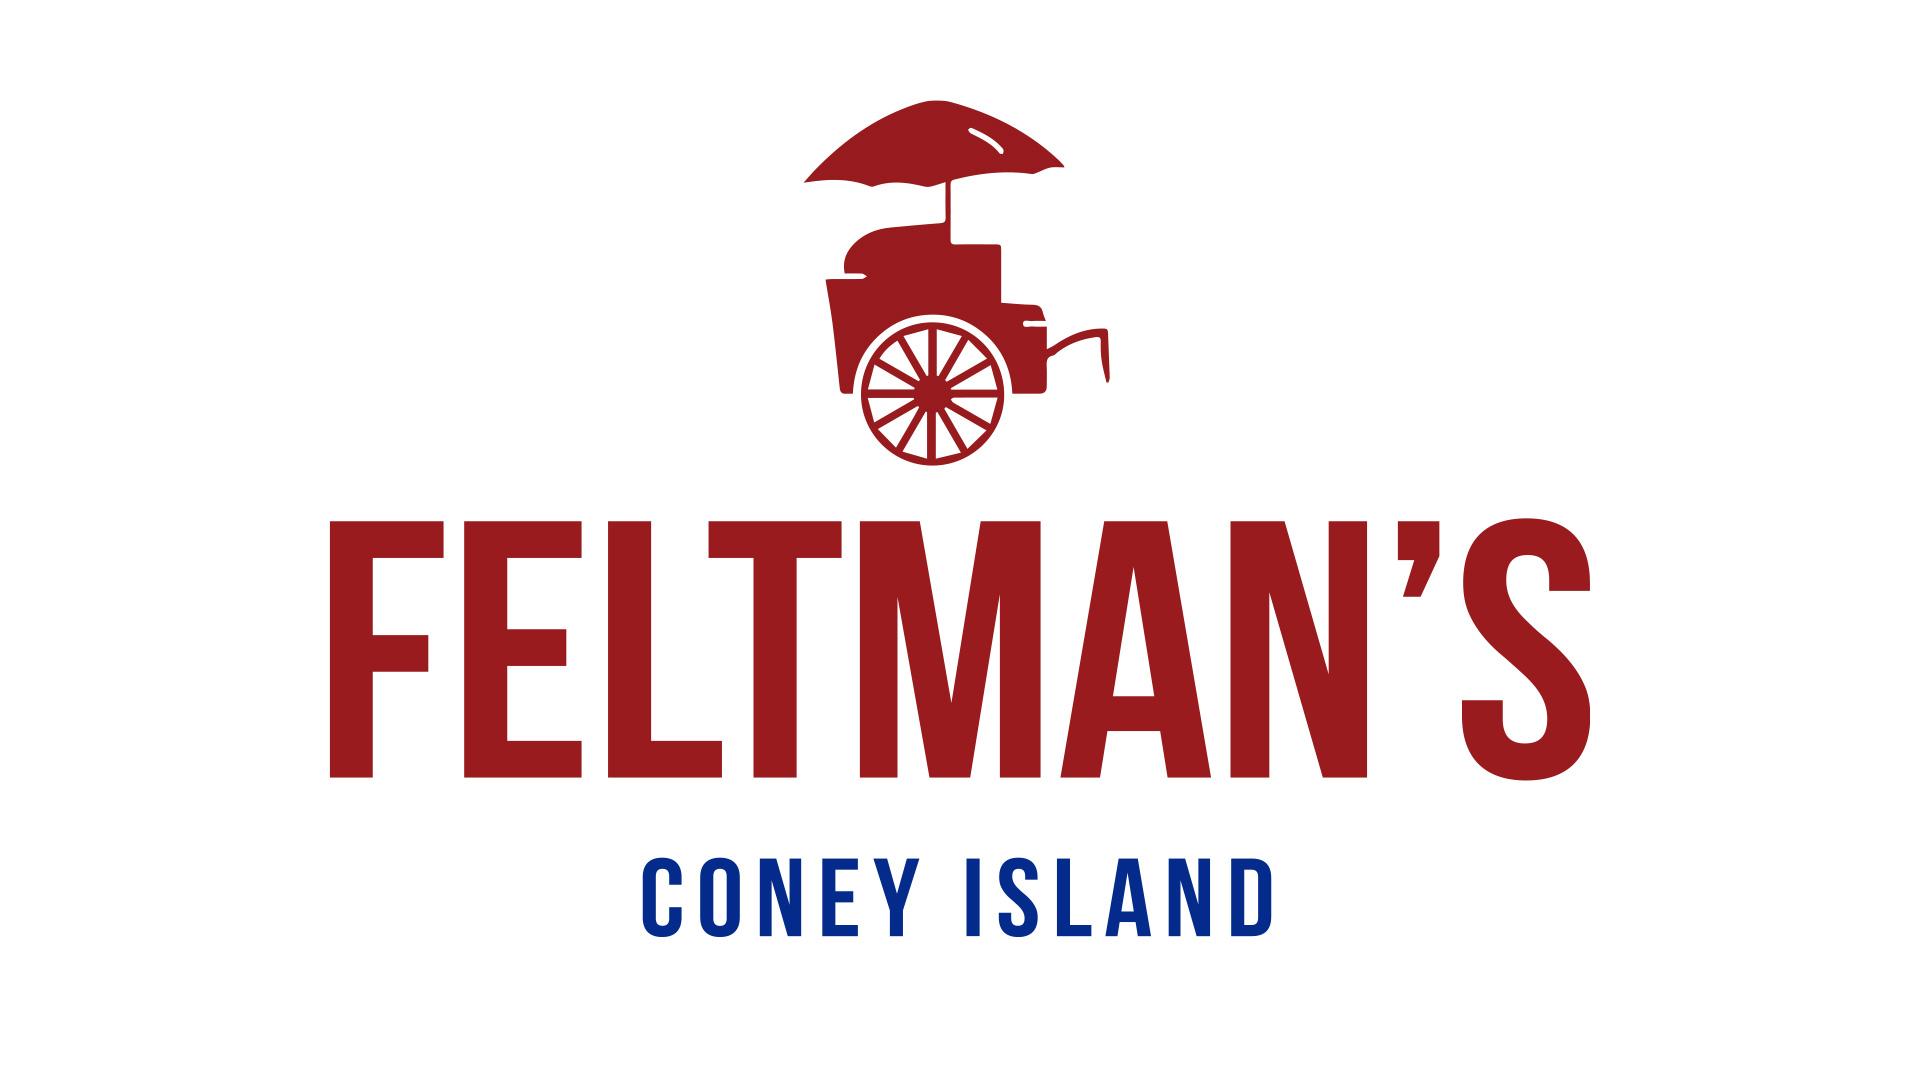 Amazon.com: Feltman's of Coney Island: Home page